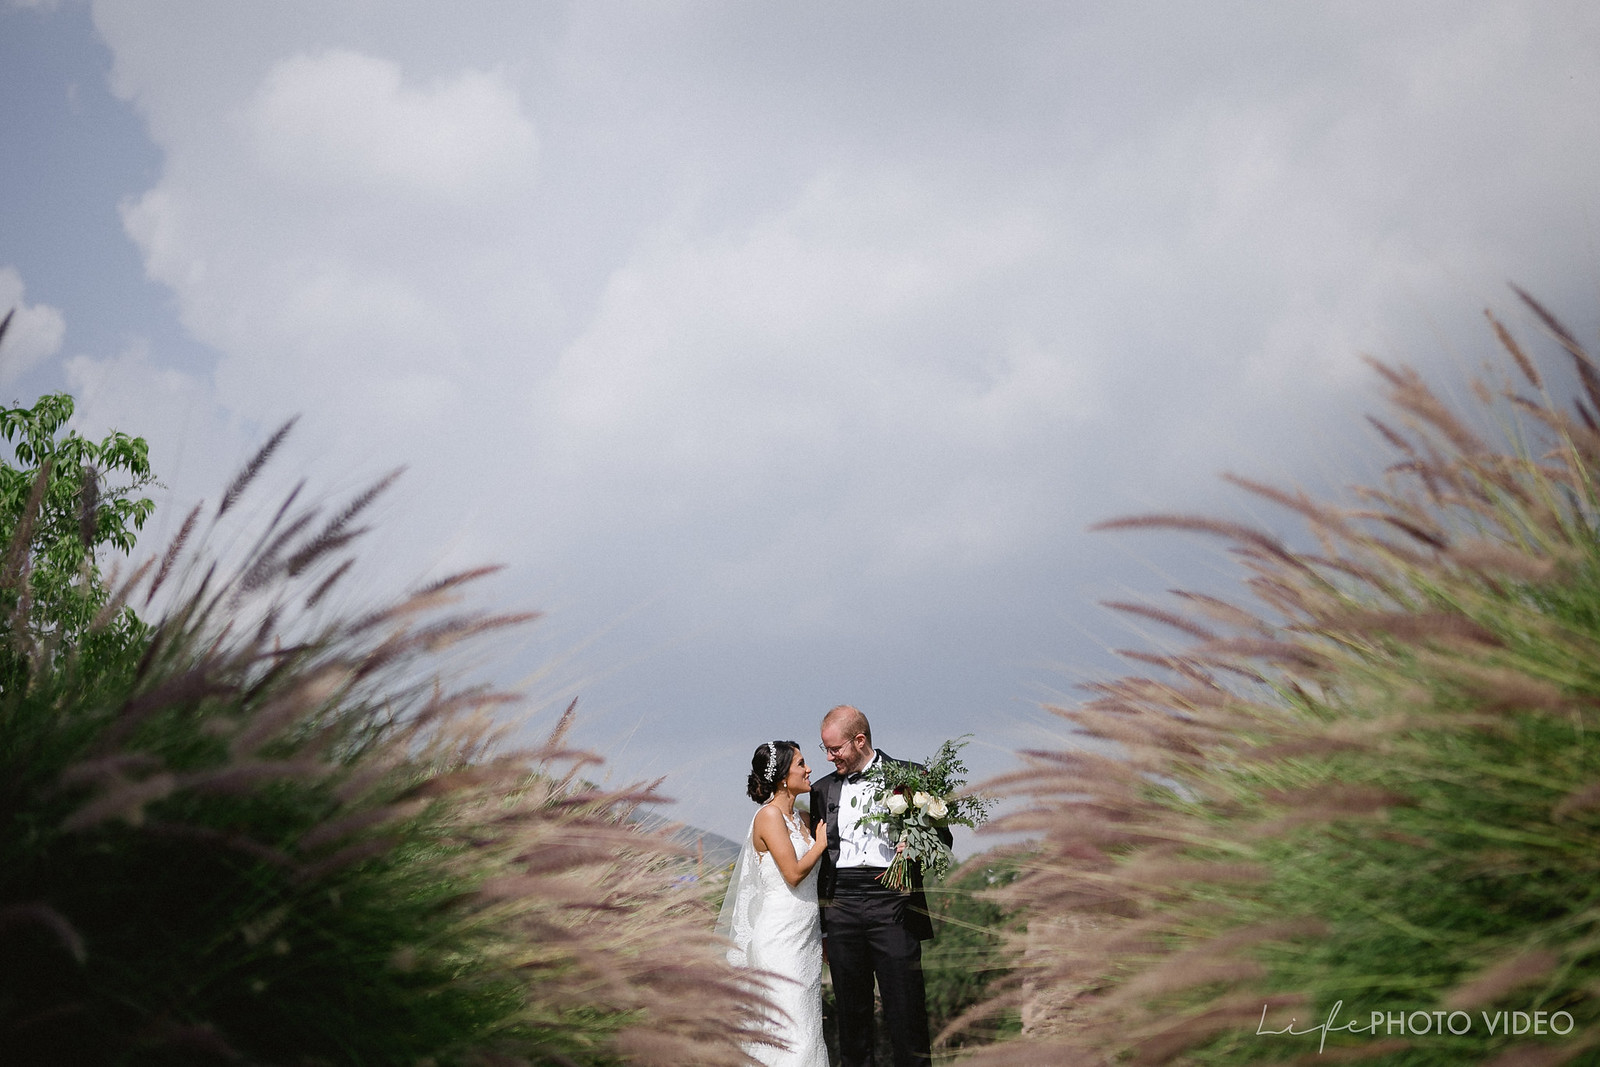 LifePhotoVideo_Boda_Guanajuato_Wedding_0019